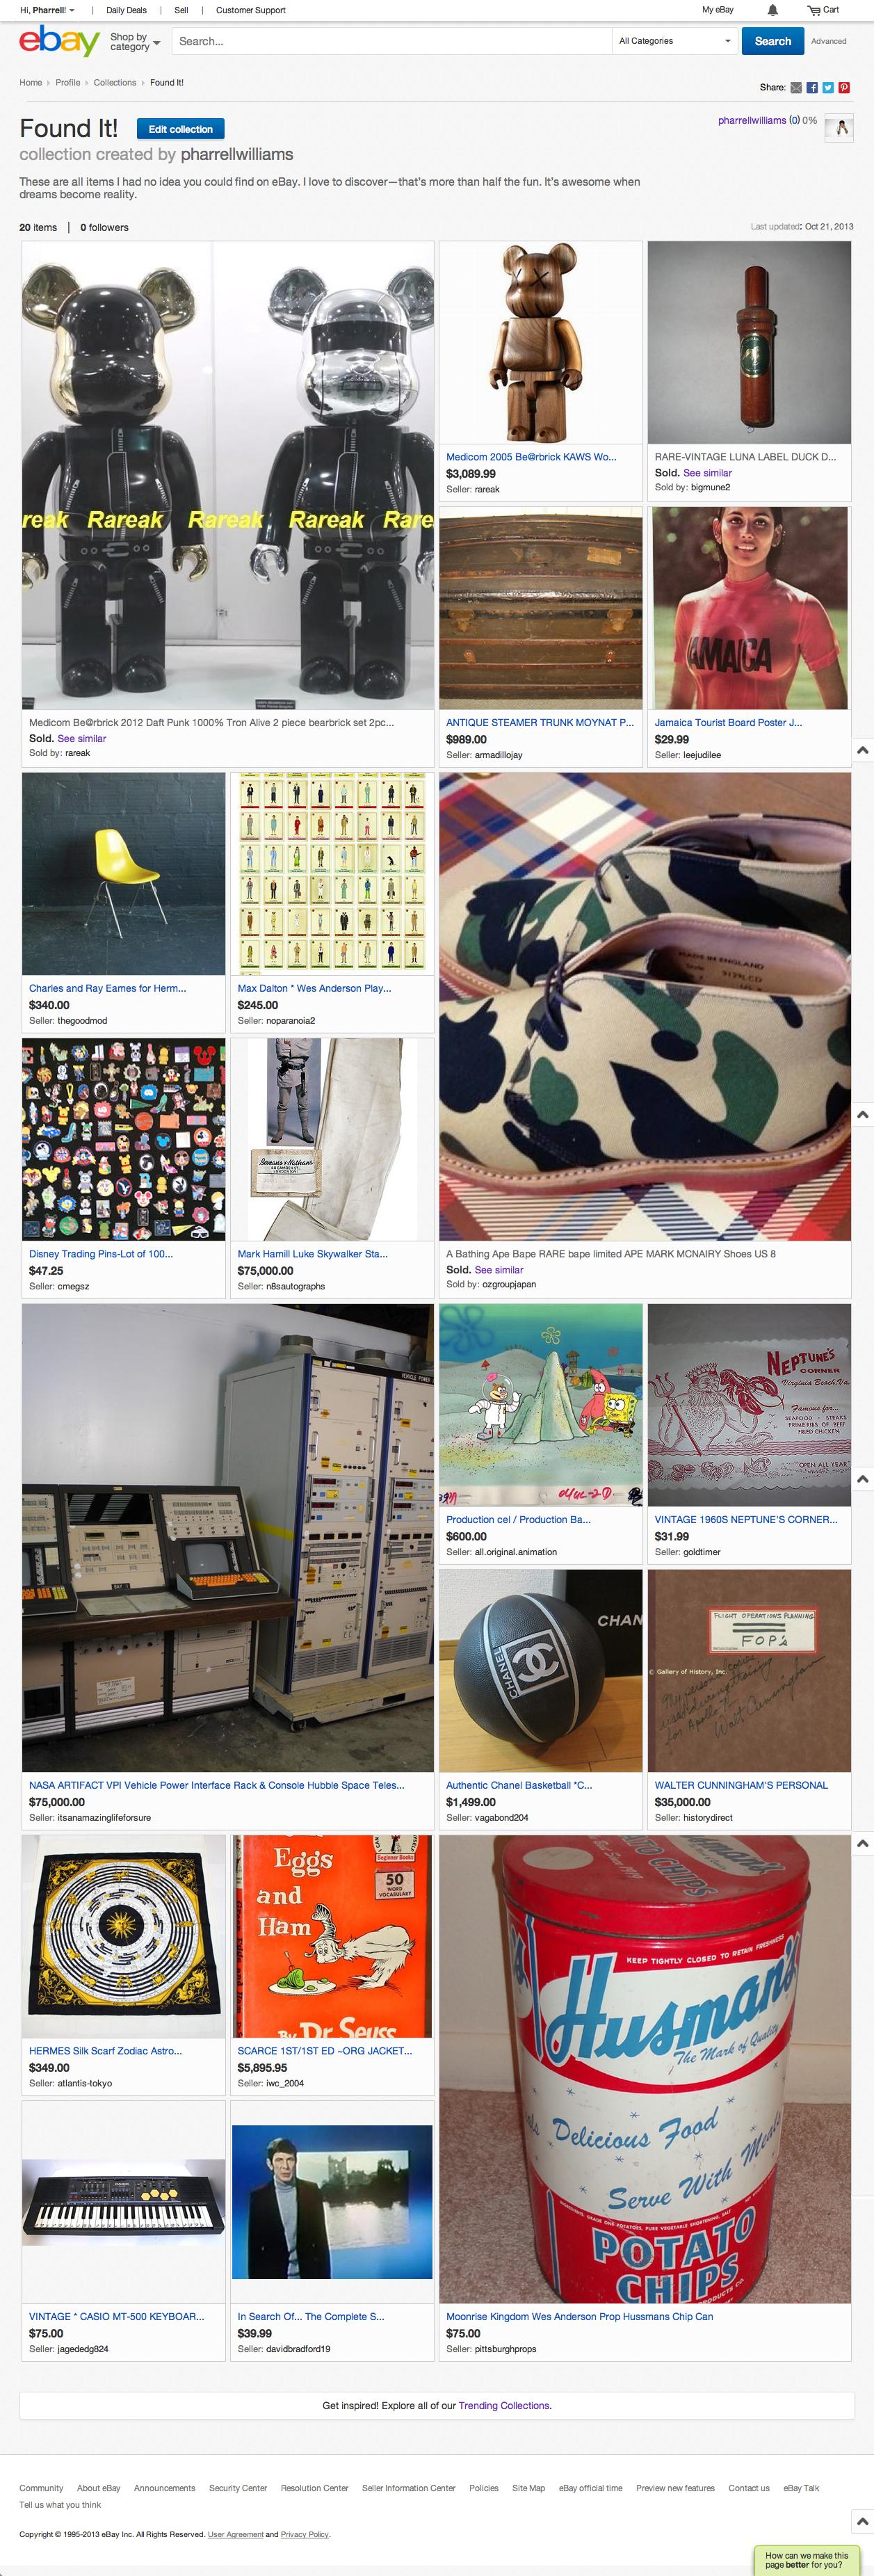 Pharrell Williams' eBay collection